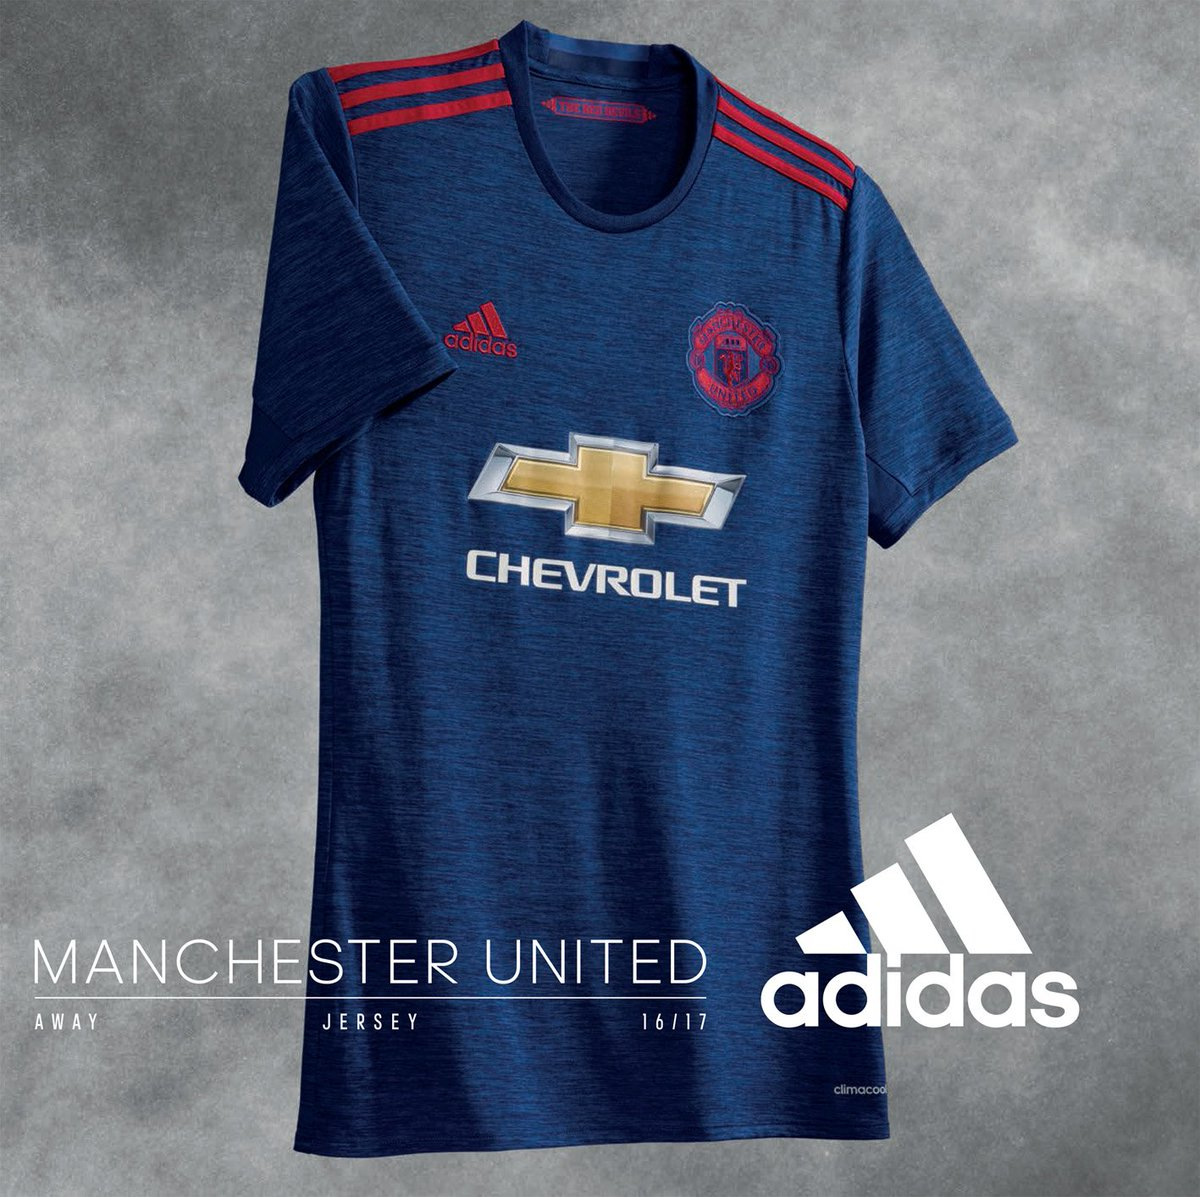 b81ccb84e Manchester United on Twitter